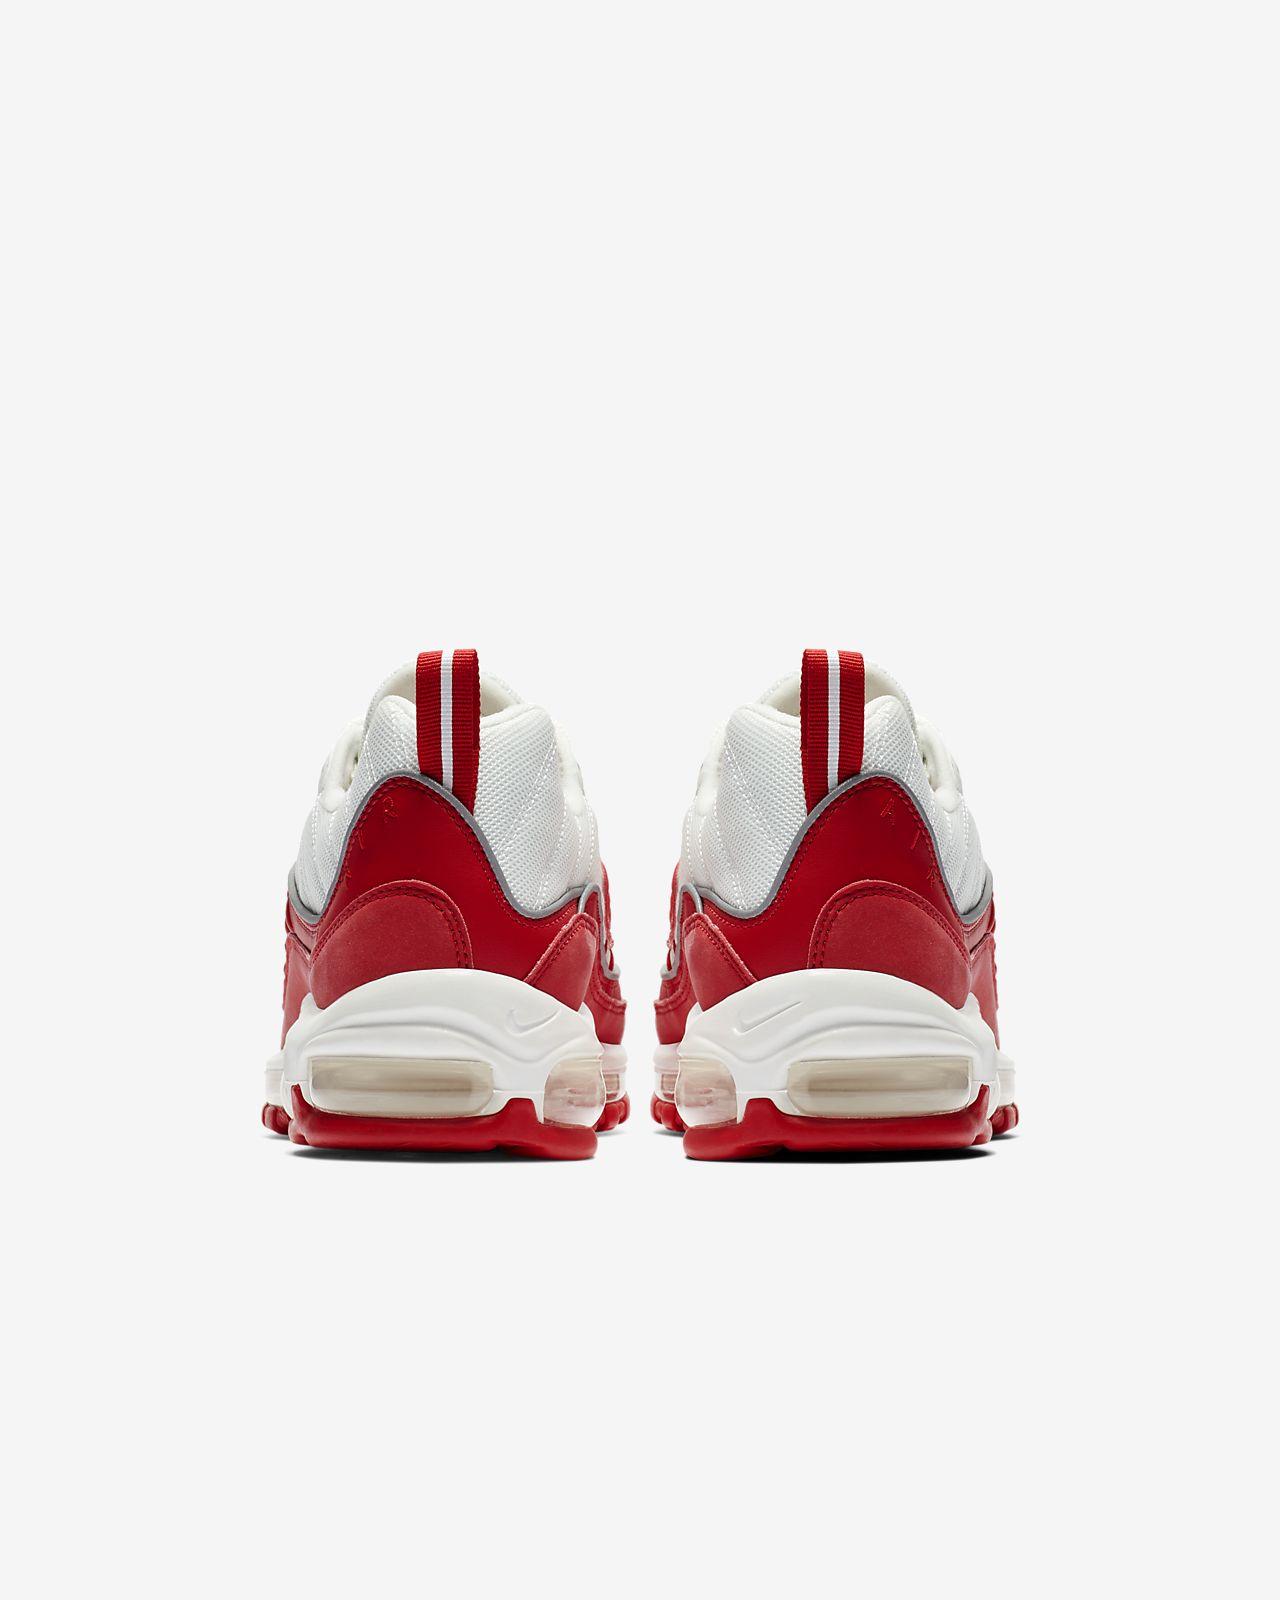 dcf4aee5177a78 Nike Air Max 98 Men s Shoe. Nike.com